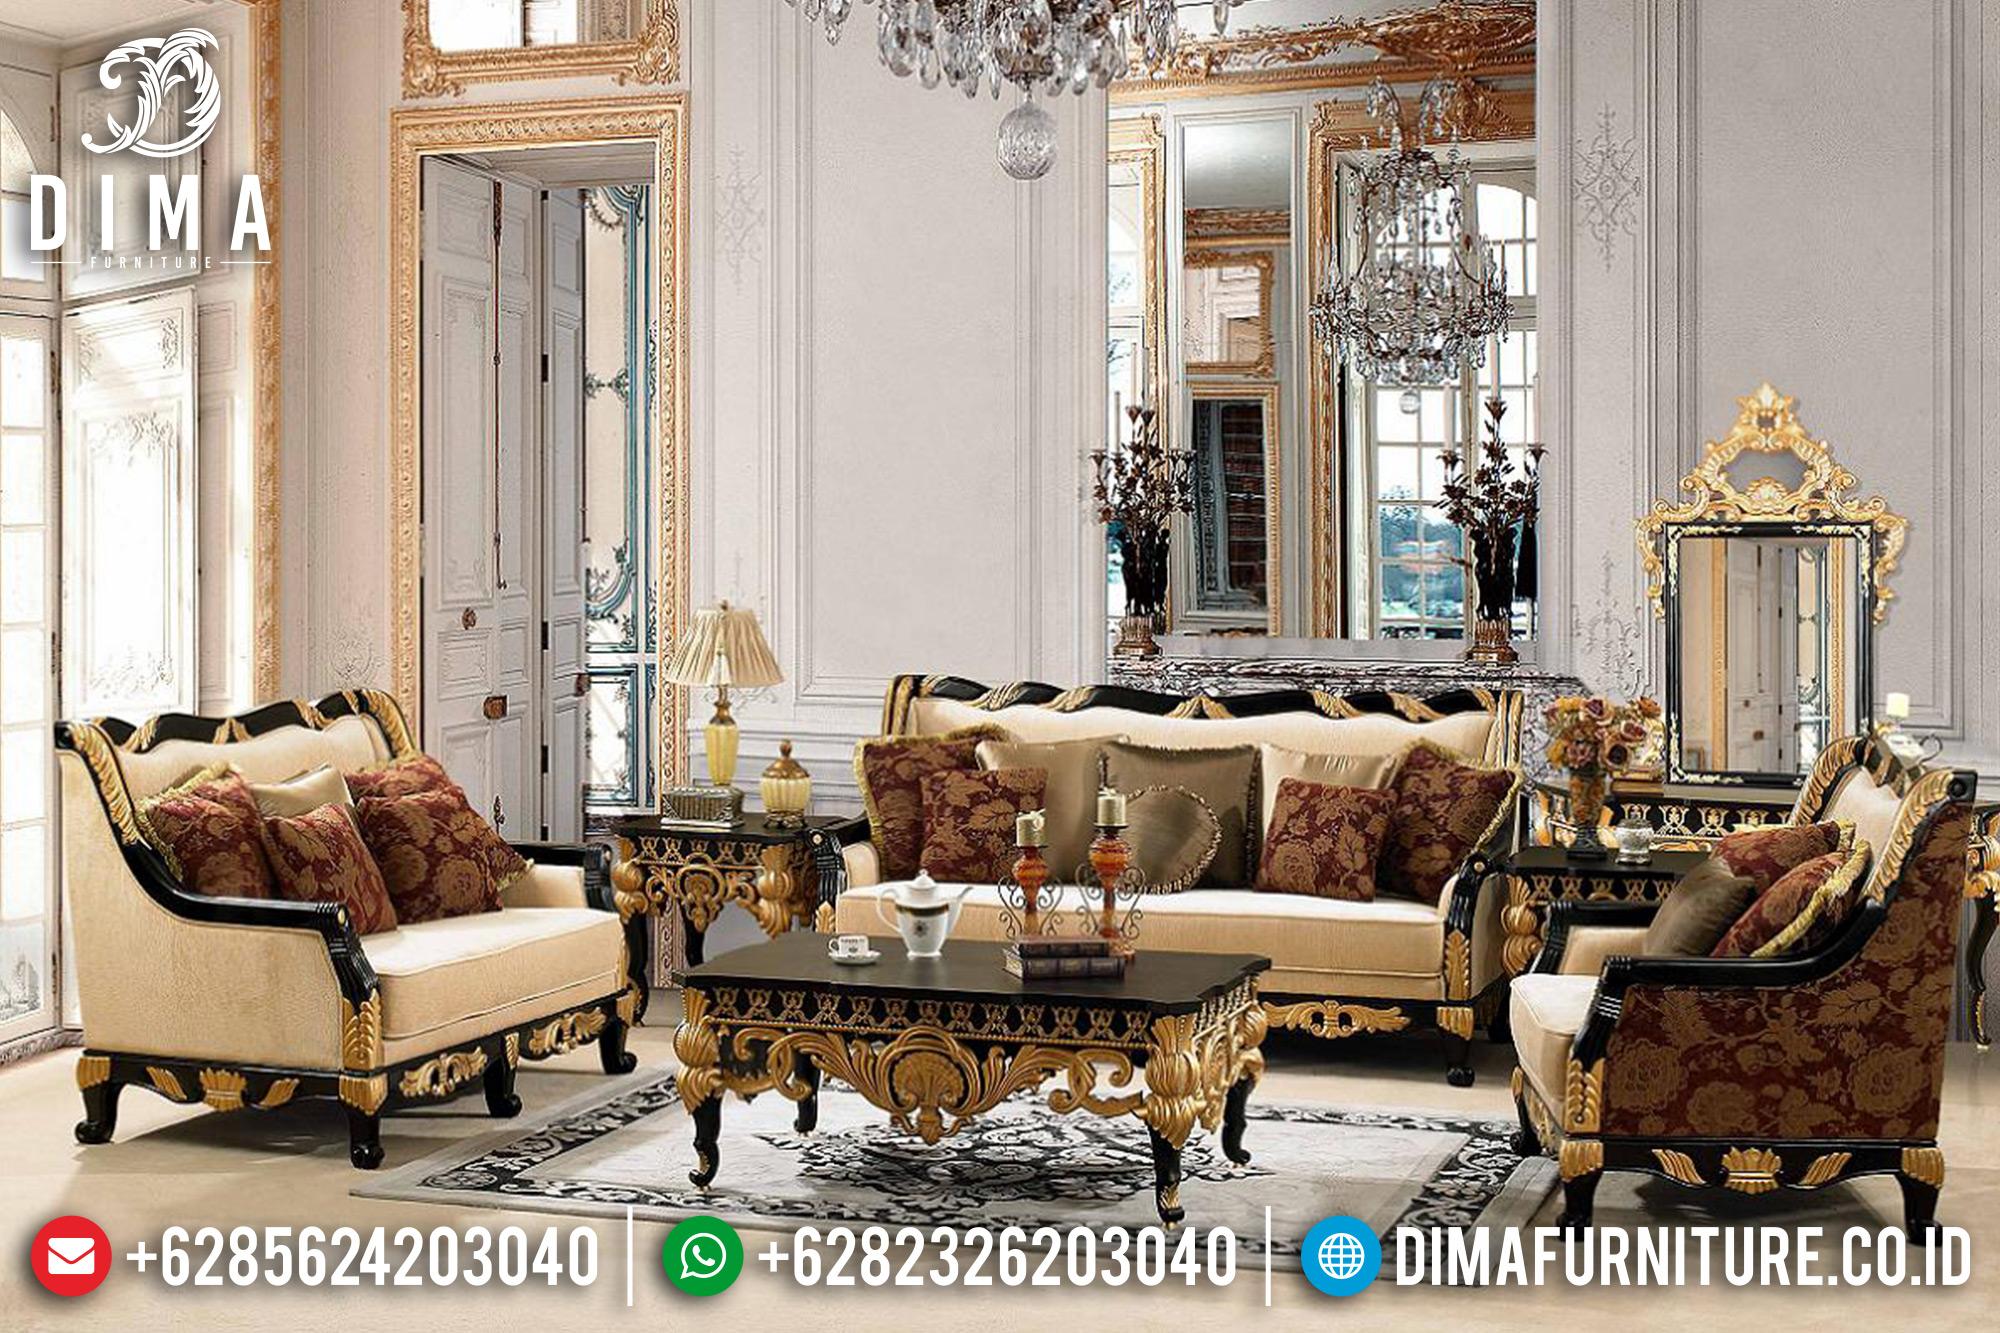 Furniture Jepara Set Sofa Tamu Mewah Jepara Natural Gold Jasco ST-0541